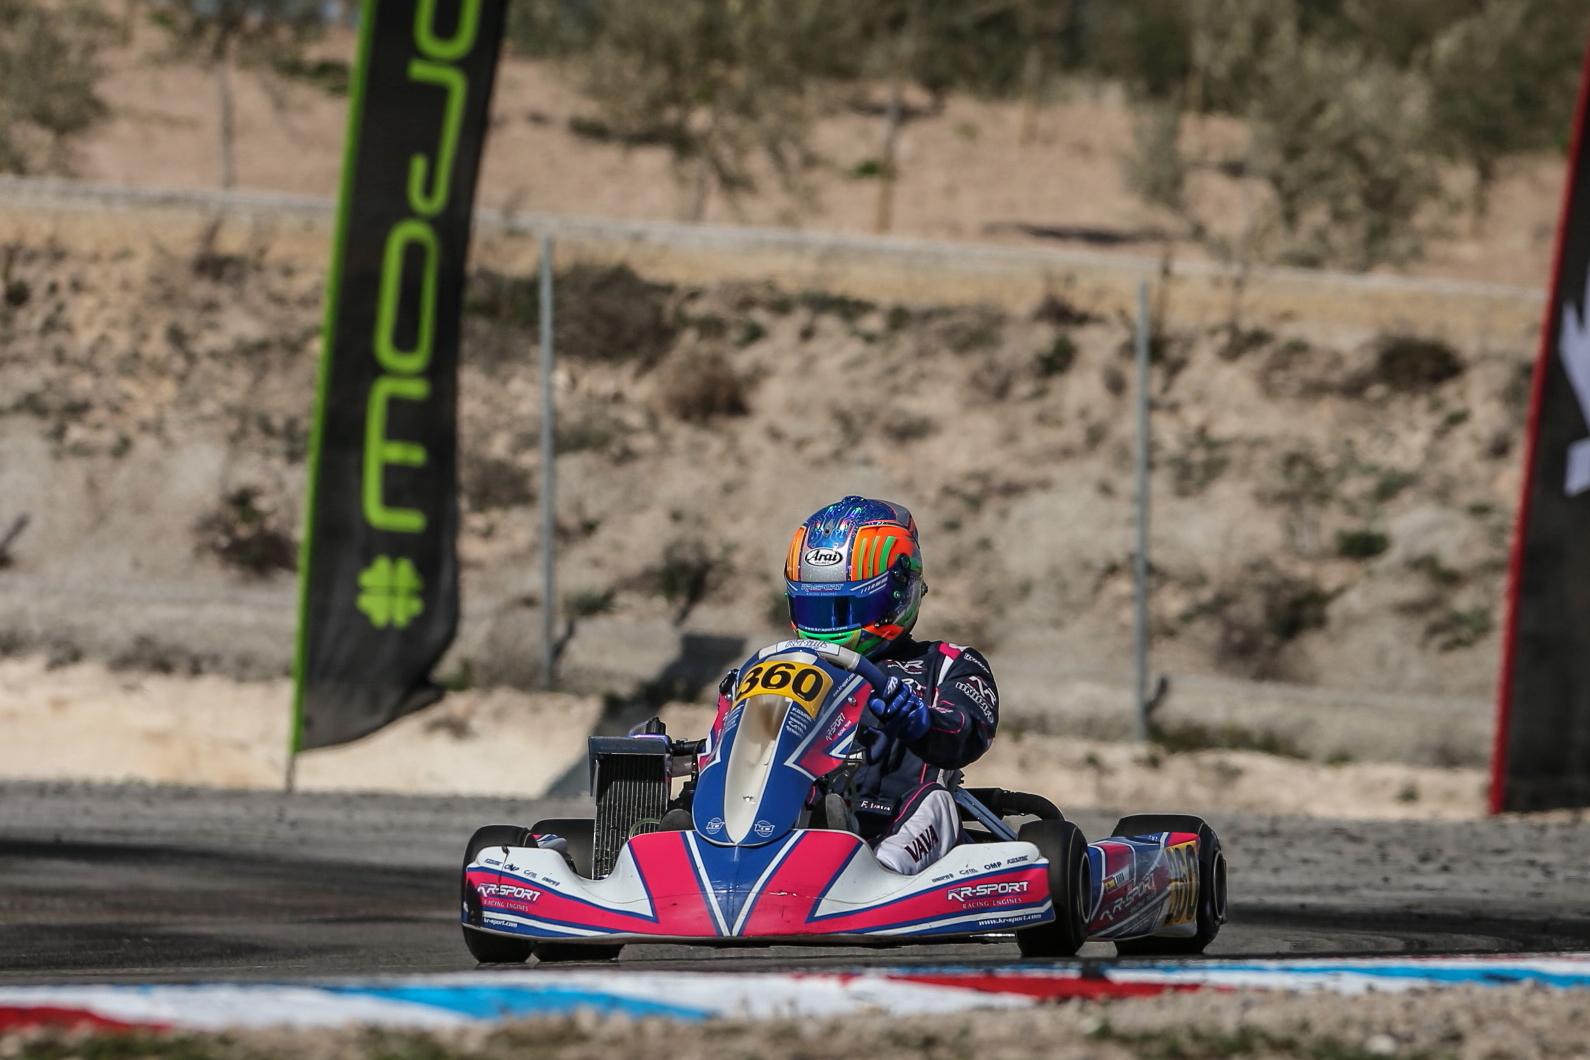 Rotax Euro Trophy Winter Cup: Meritorio P7 final entre 69 participantes para Filip Vava